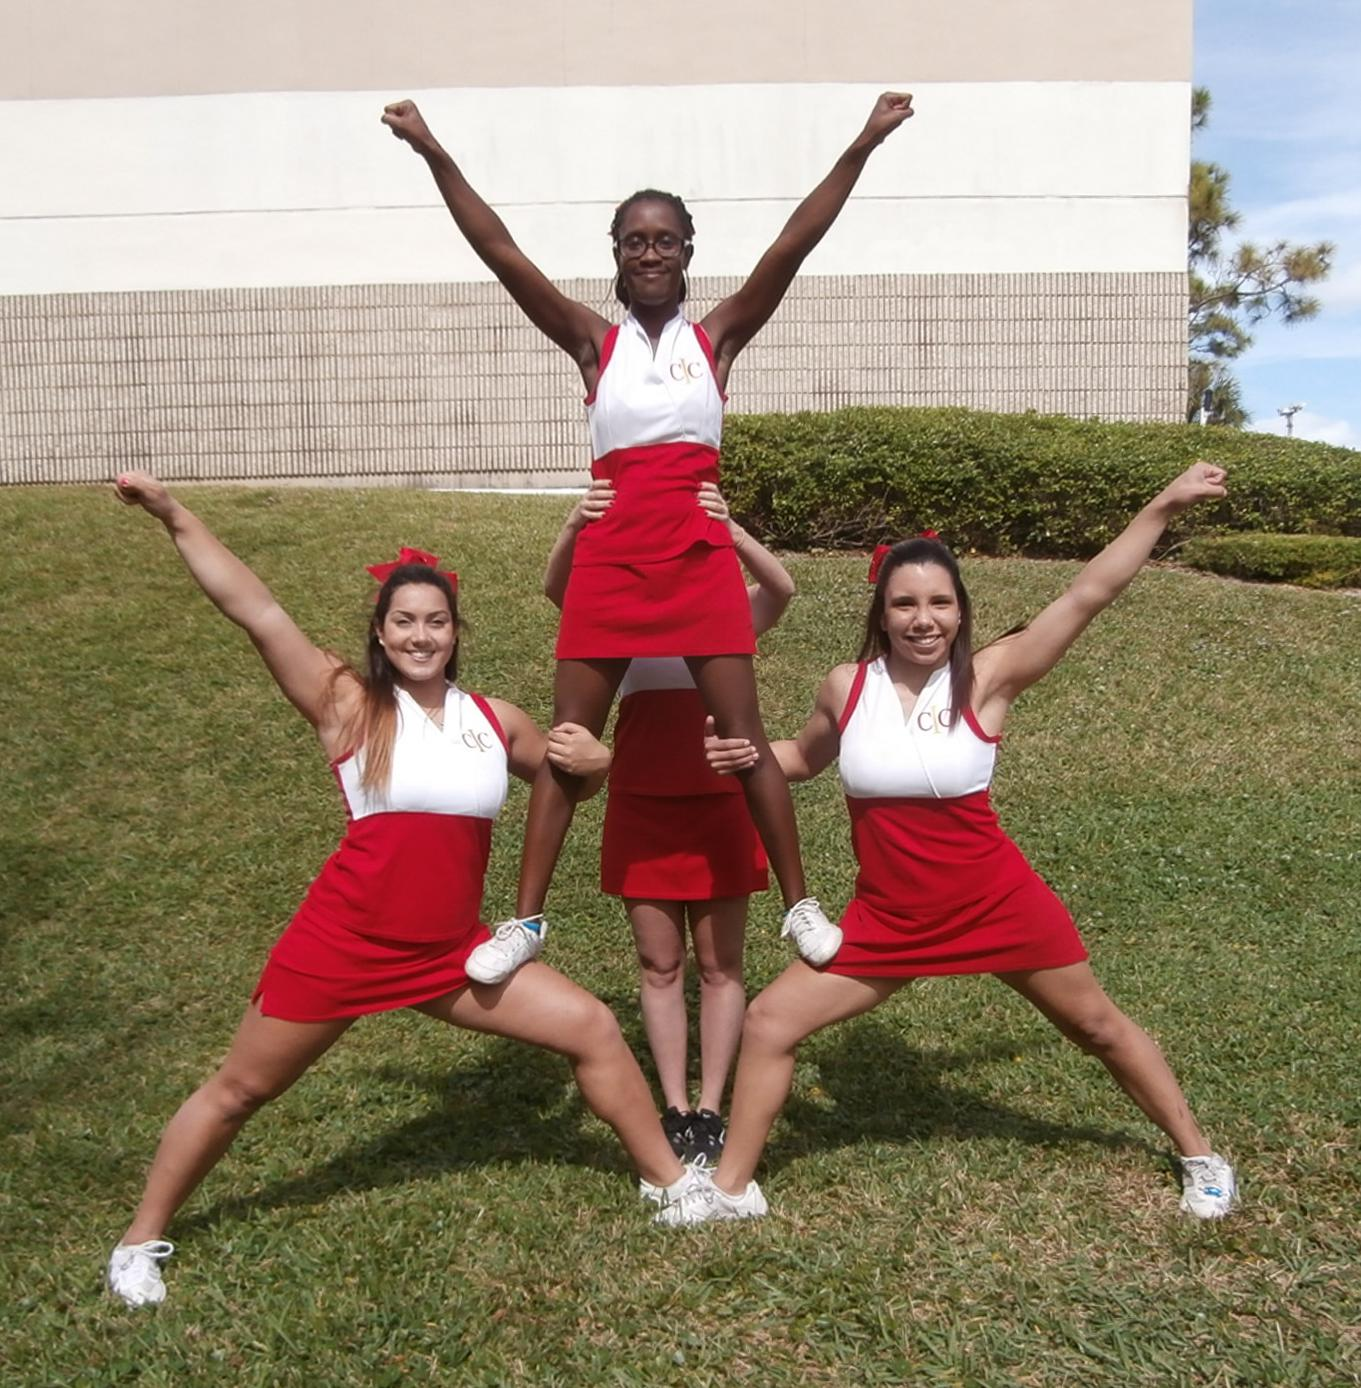 information on cheerleading stunts Serious cheerleading injuries on the rise due to dangerous stunts serious cheerleading injuries increasing with risky cheerleading stunts.